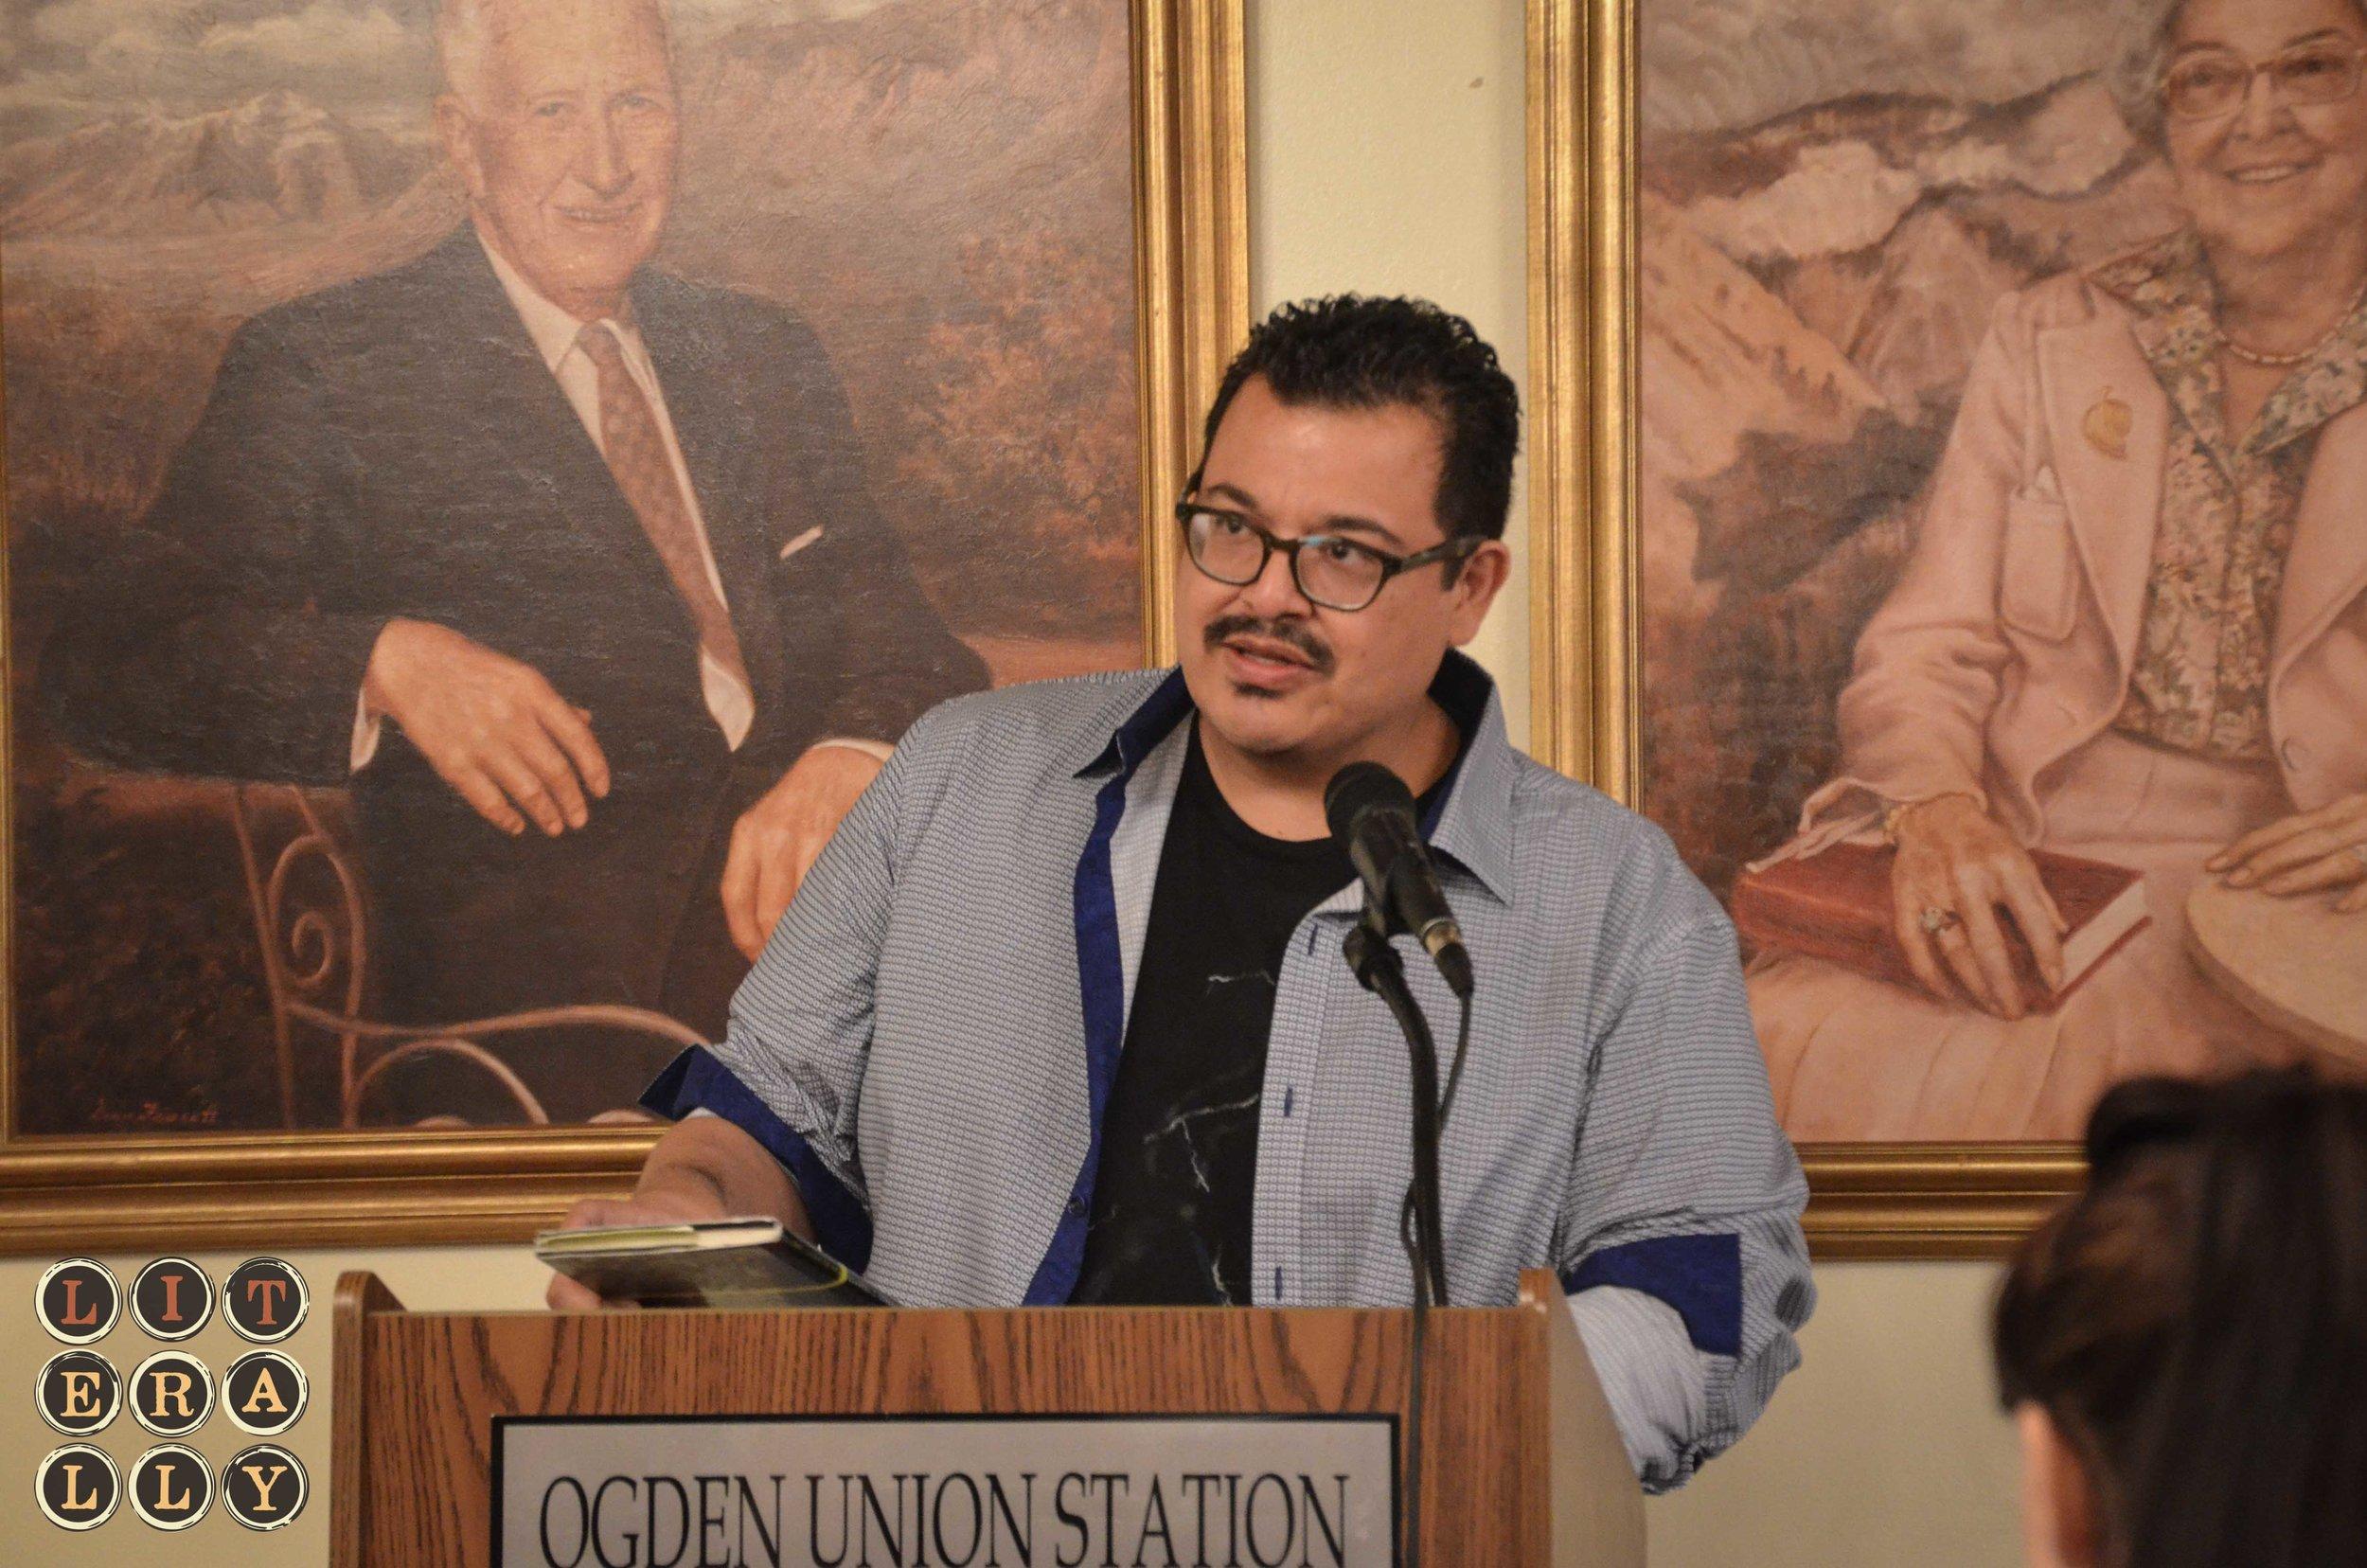 Eduardo C. Corral during the Utah Humanities Book Festival